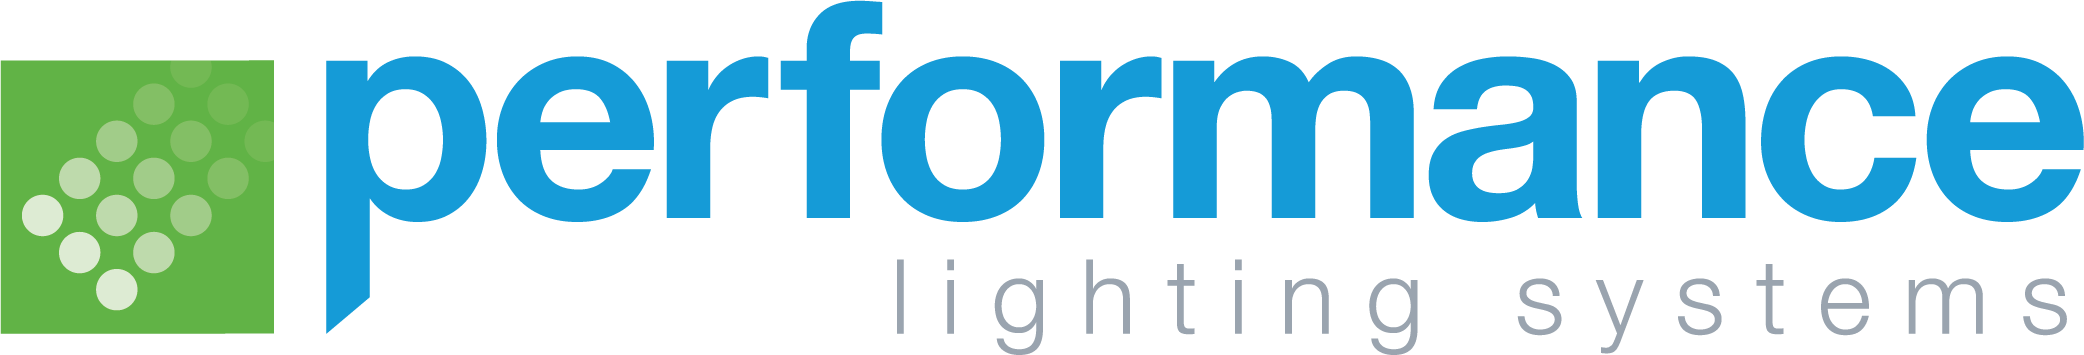 Performance Lighting System logo